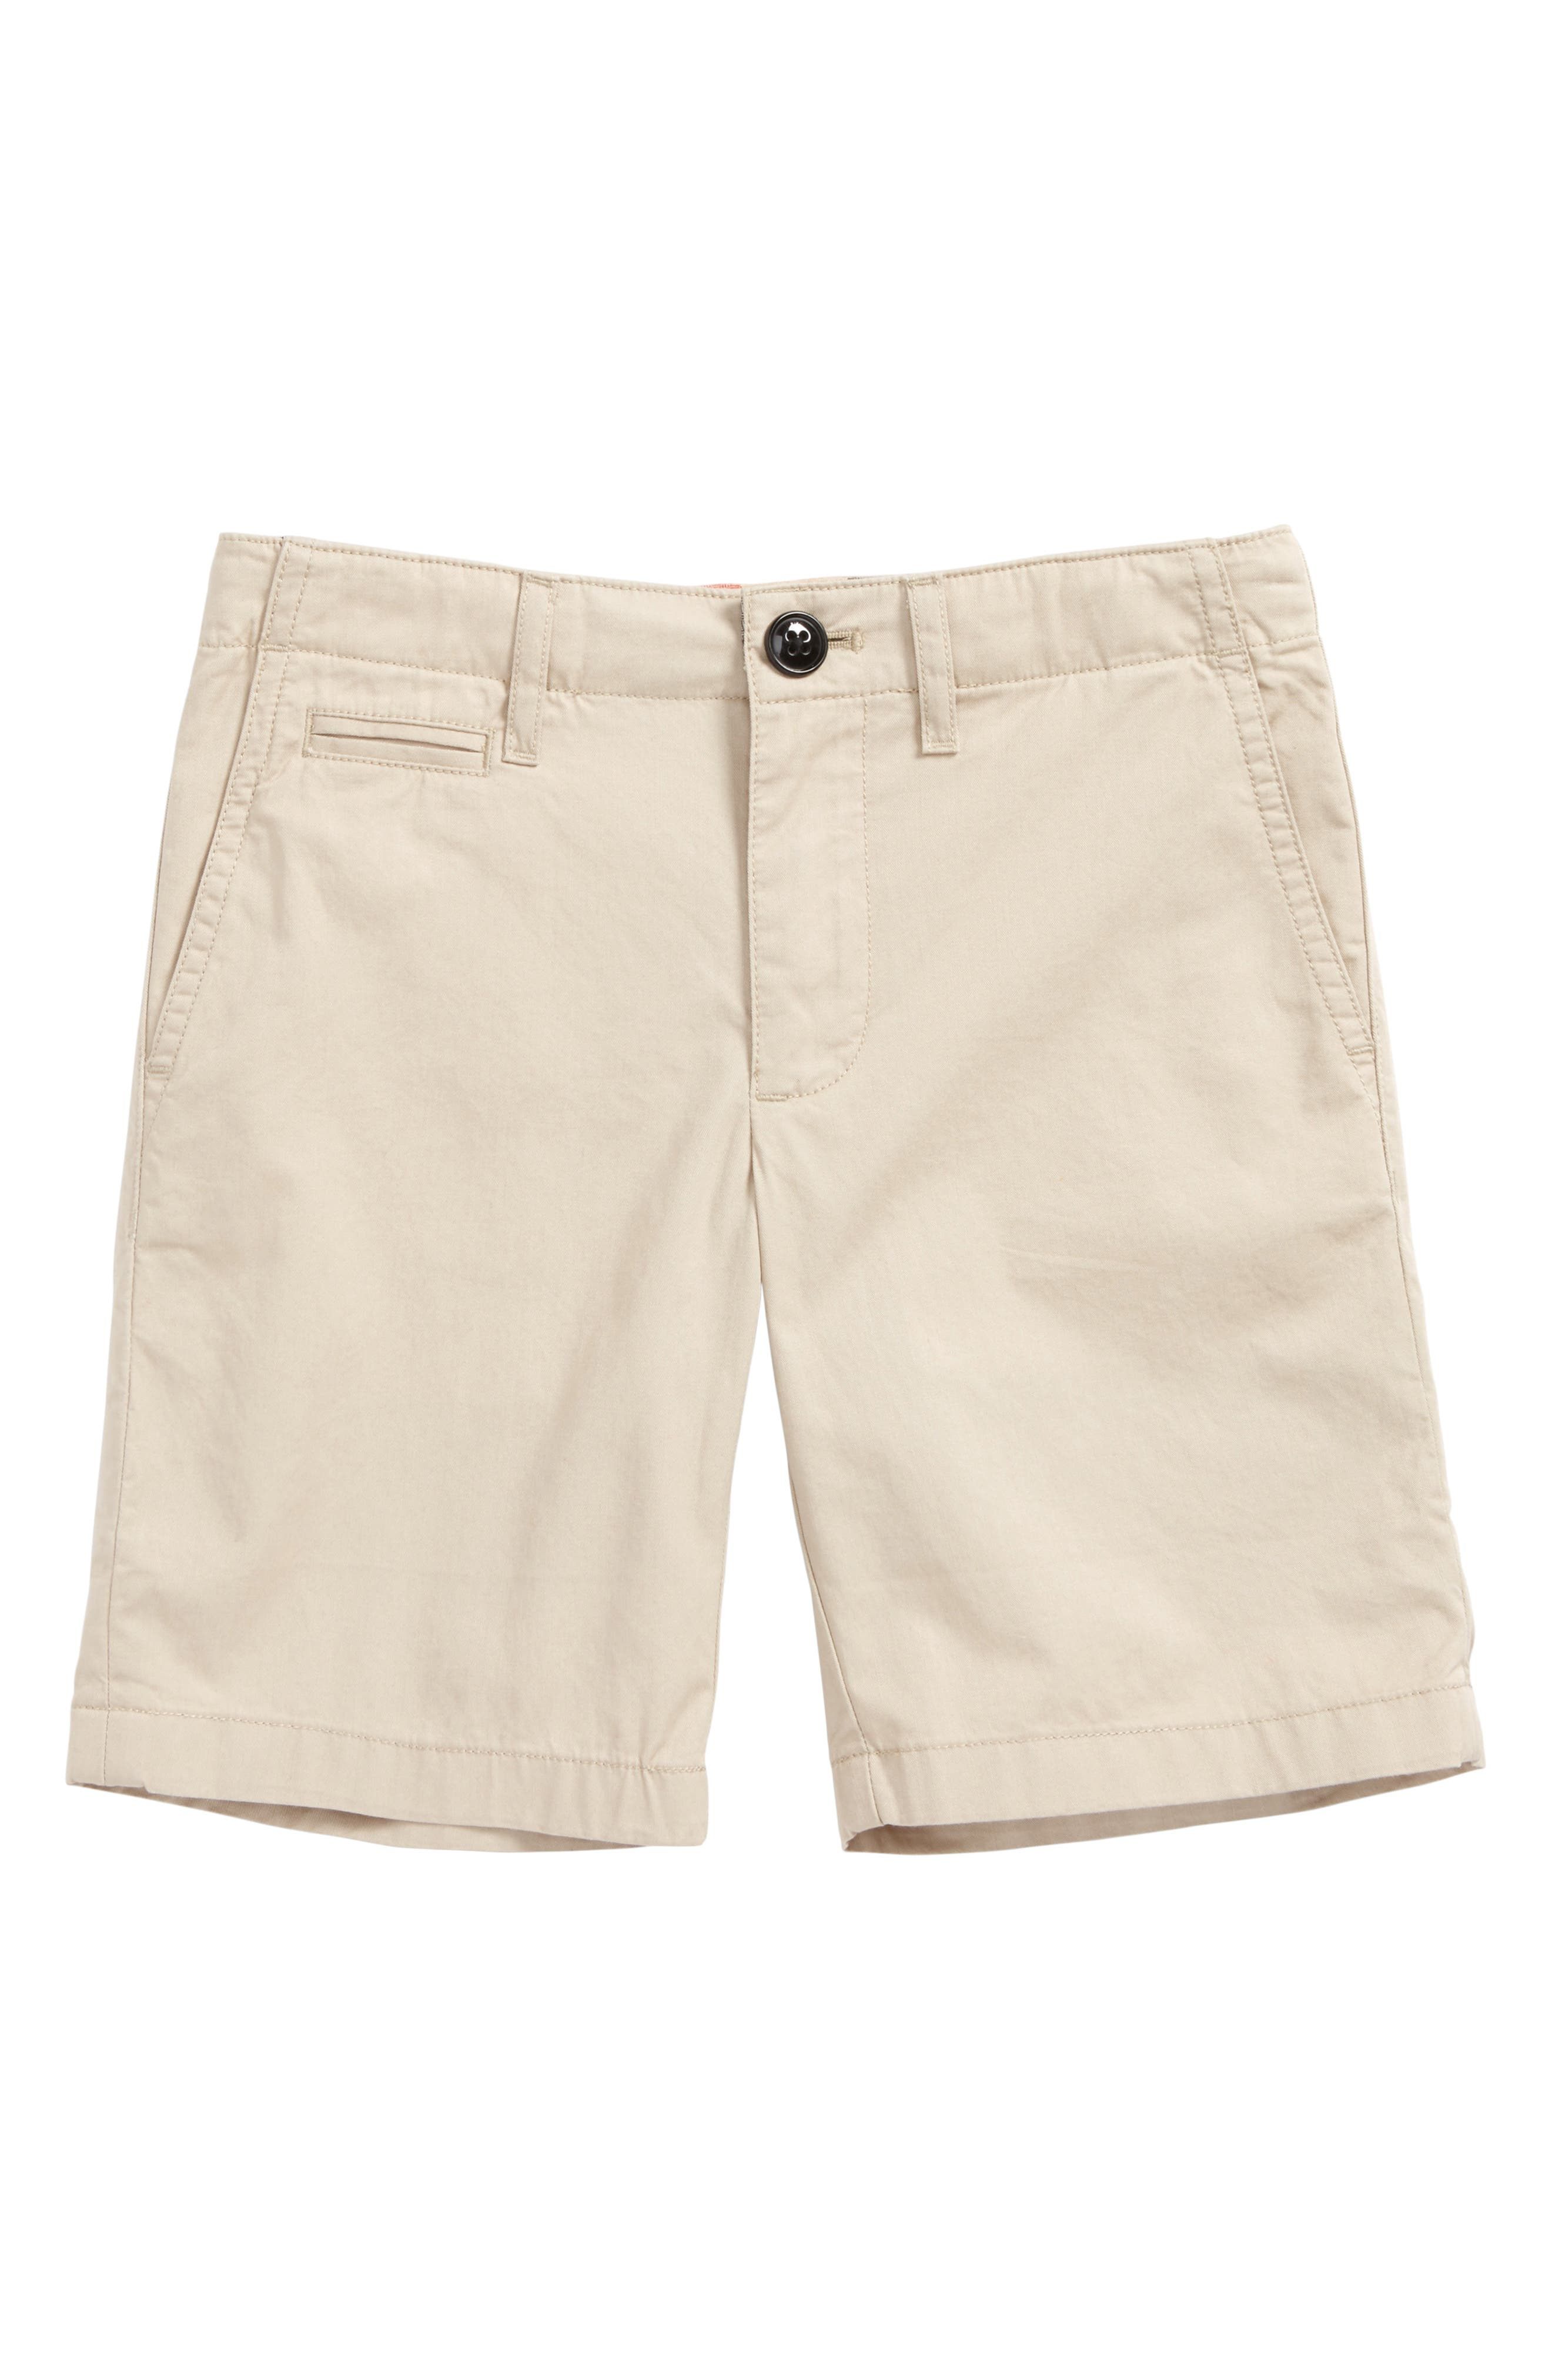 Tristen Shorts,                             Main thumbnail 1, color,